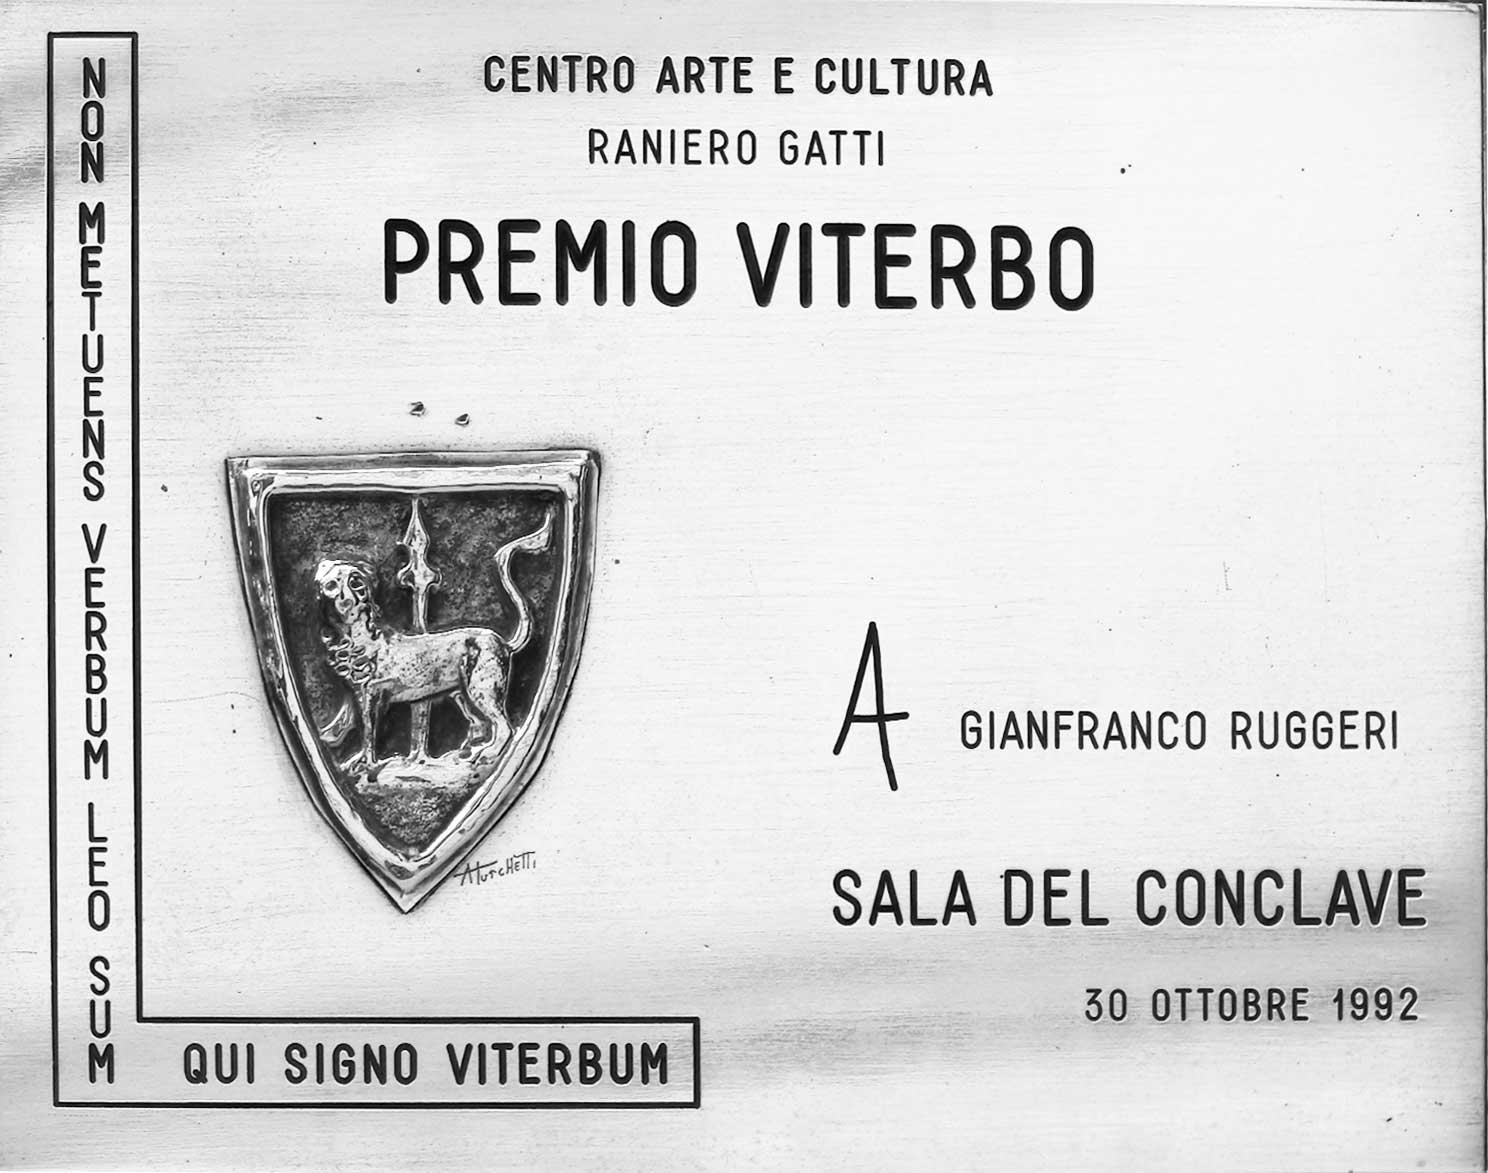 20 - Premio Viterbo 1992 - Attestato